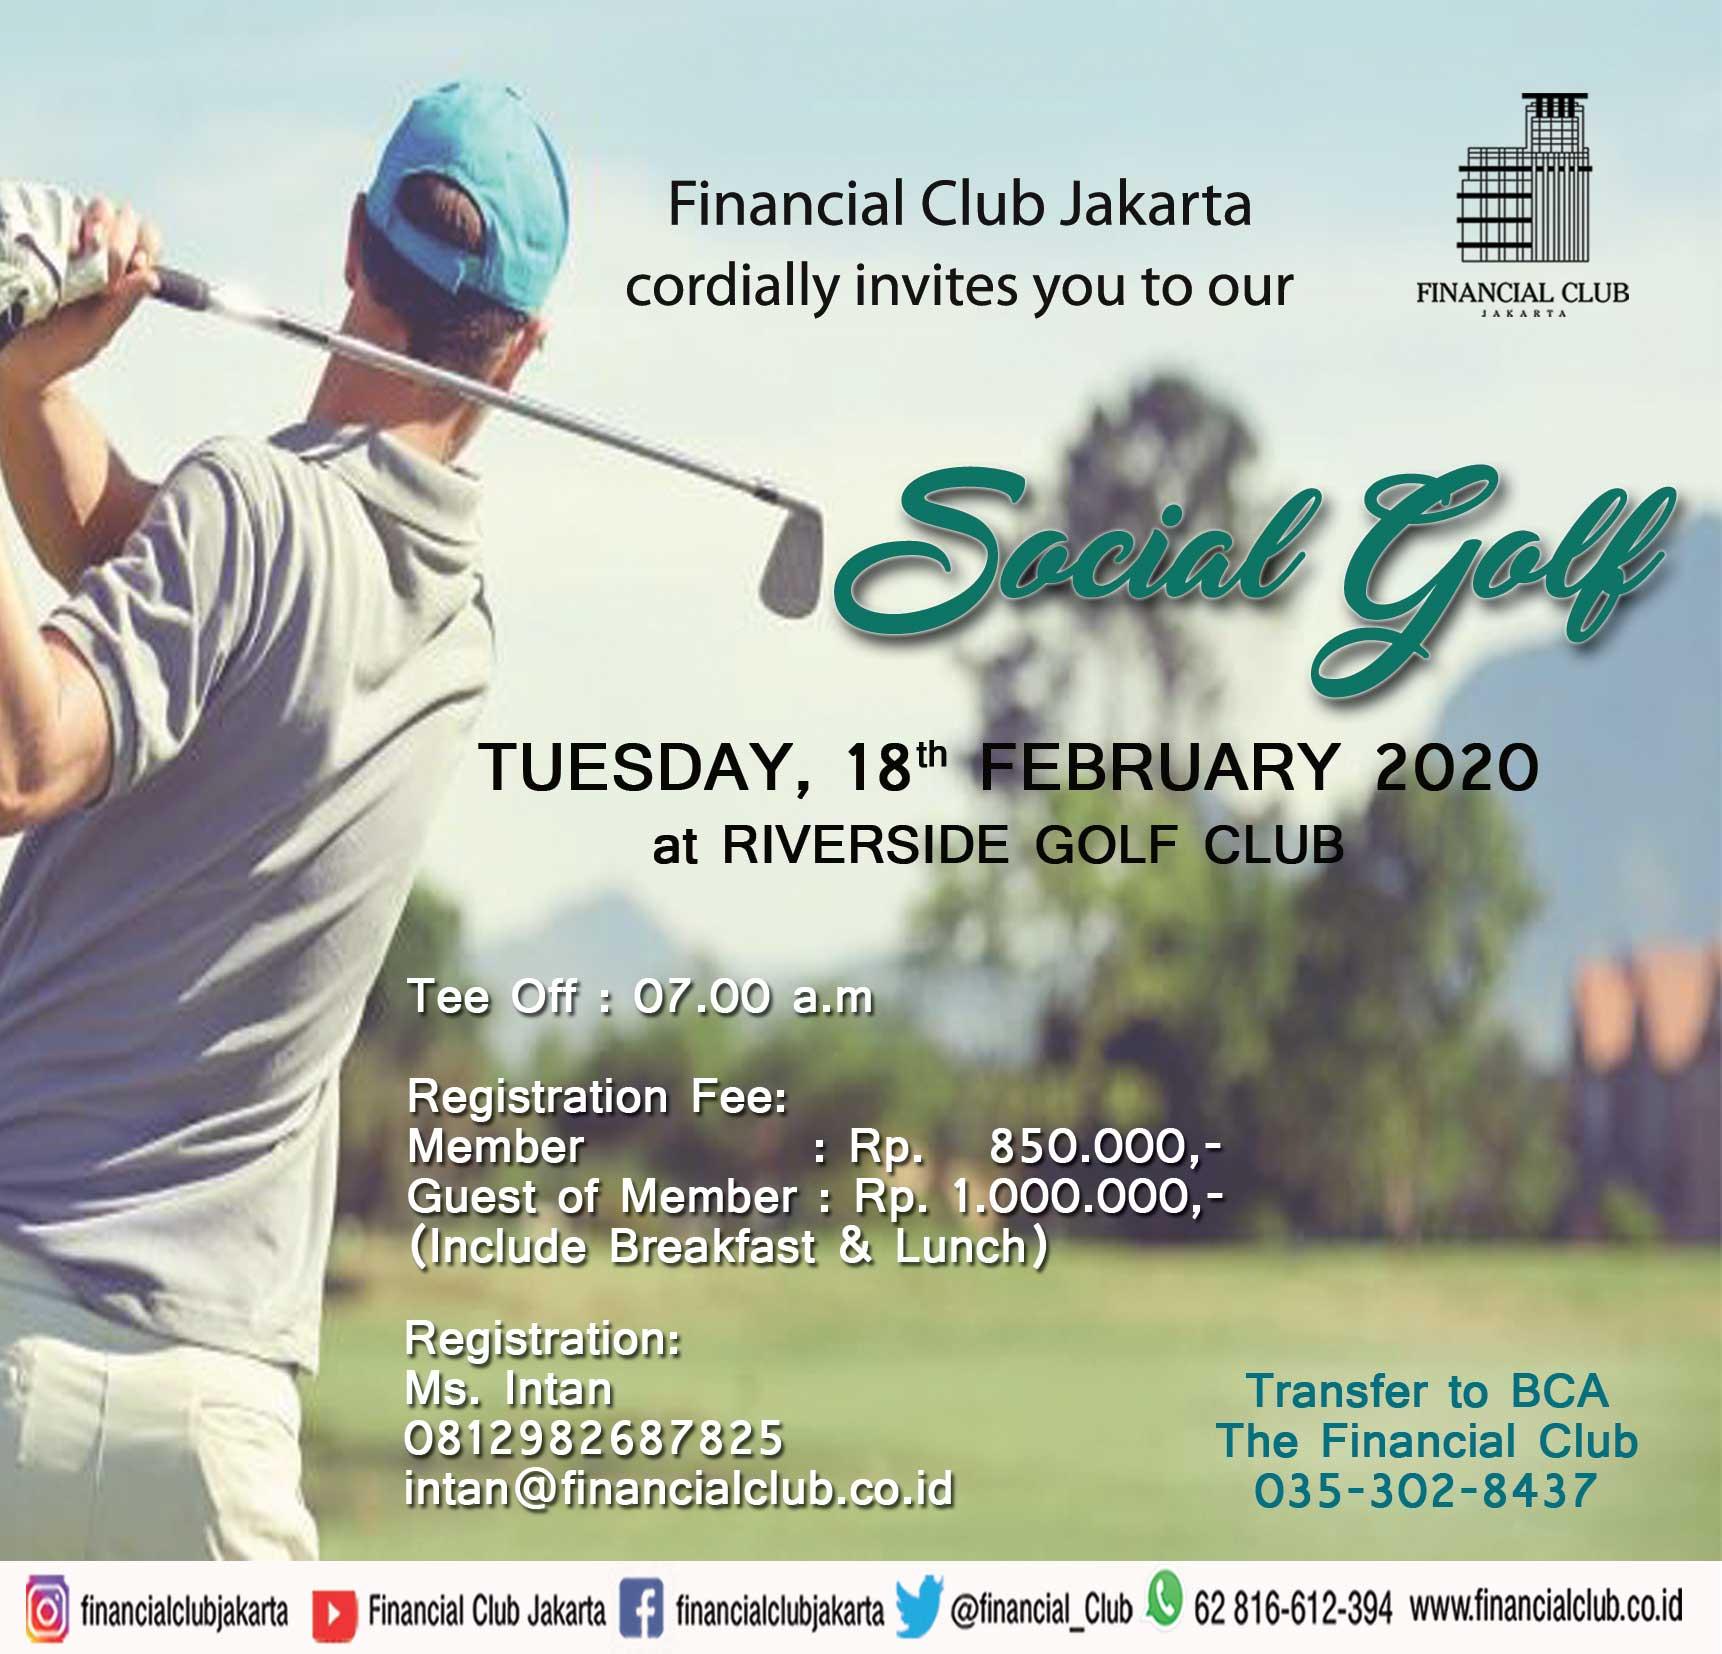 Social Golf at Riverside Golf Club, Tuesday 18th February 2020